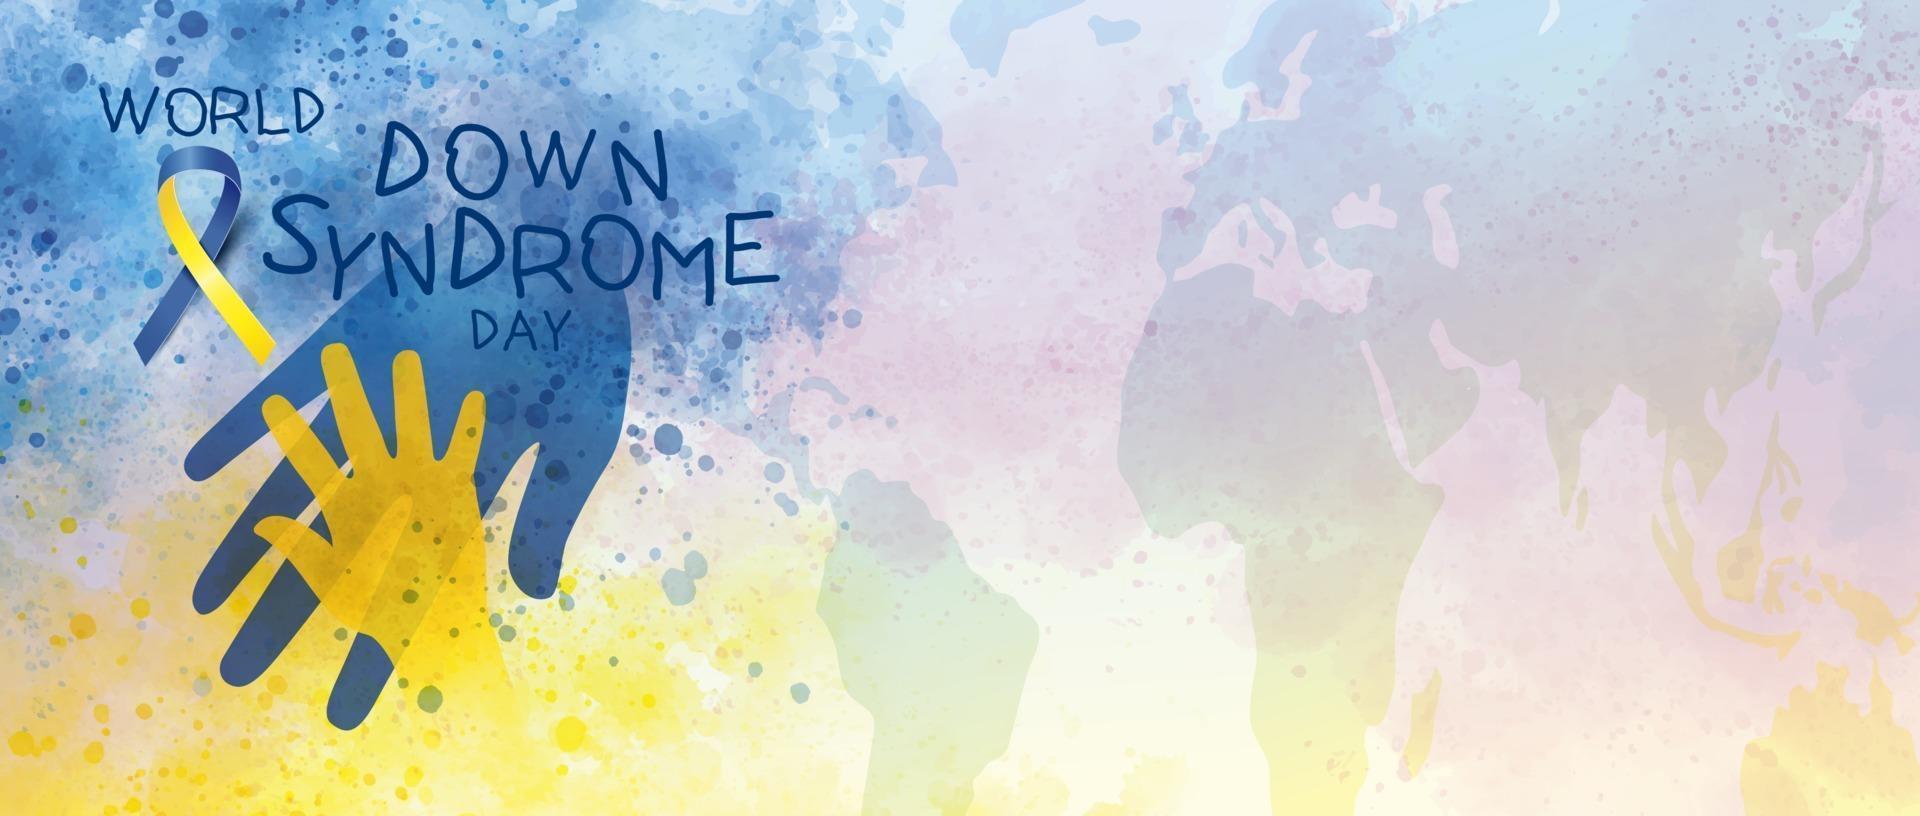 Welt-Down-Syndrom-Tagesfahnenentwurf der Aquarellvektorillustration vektor